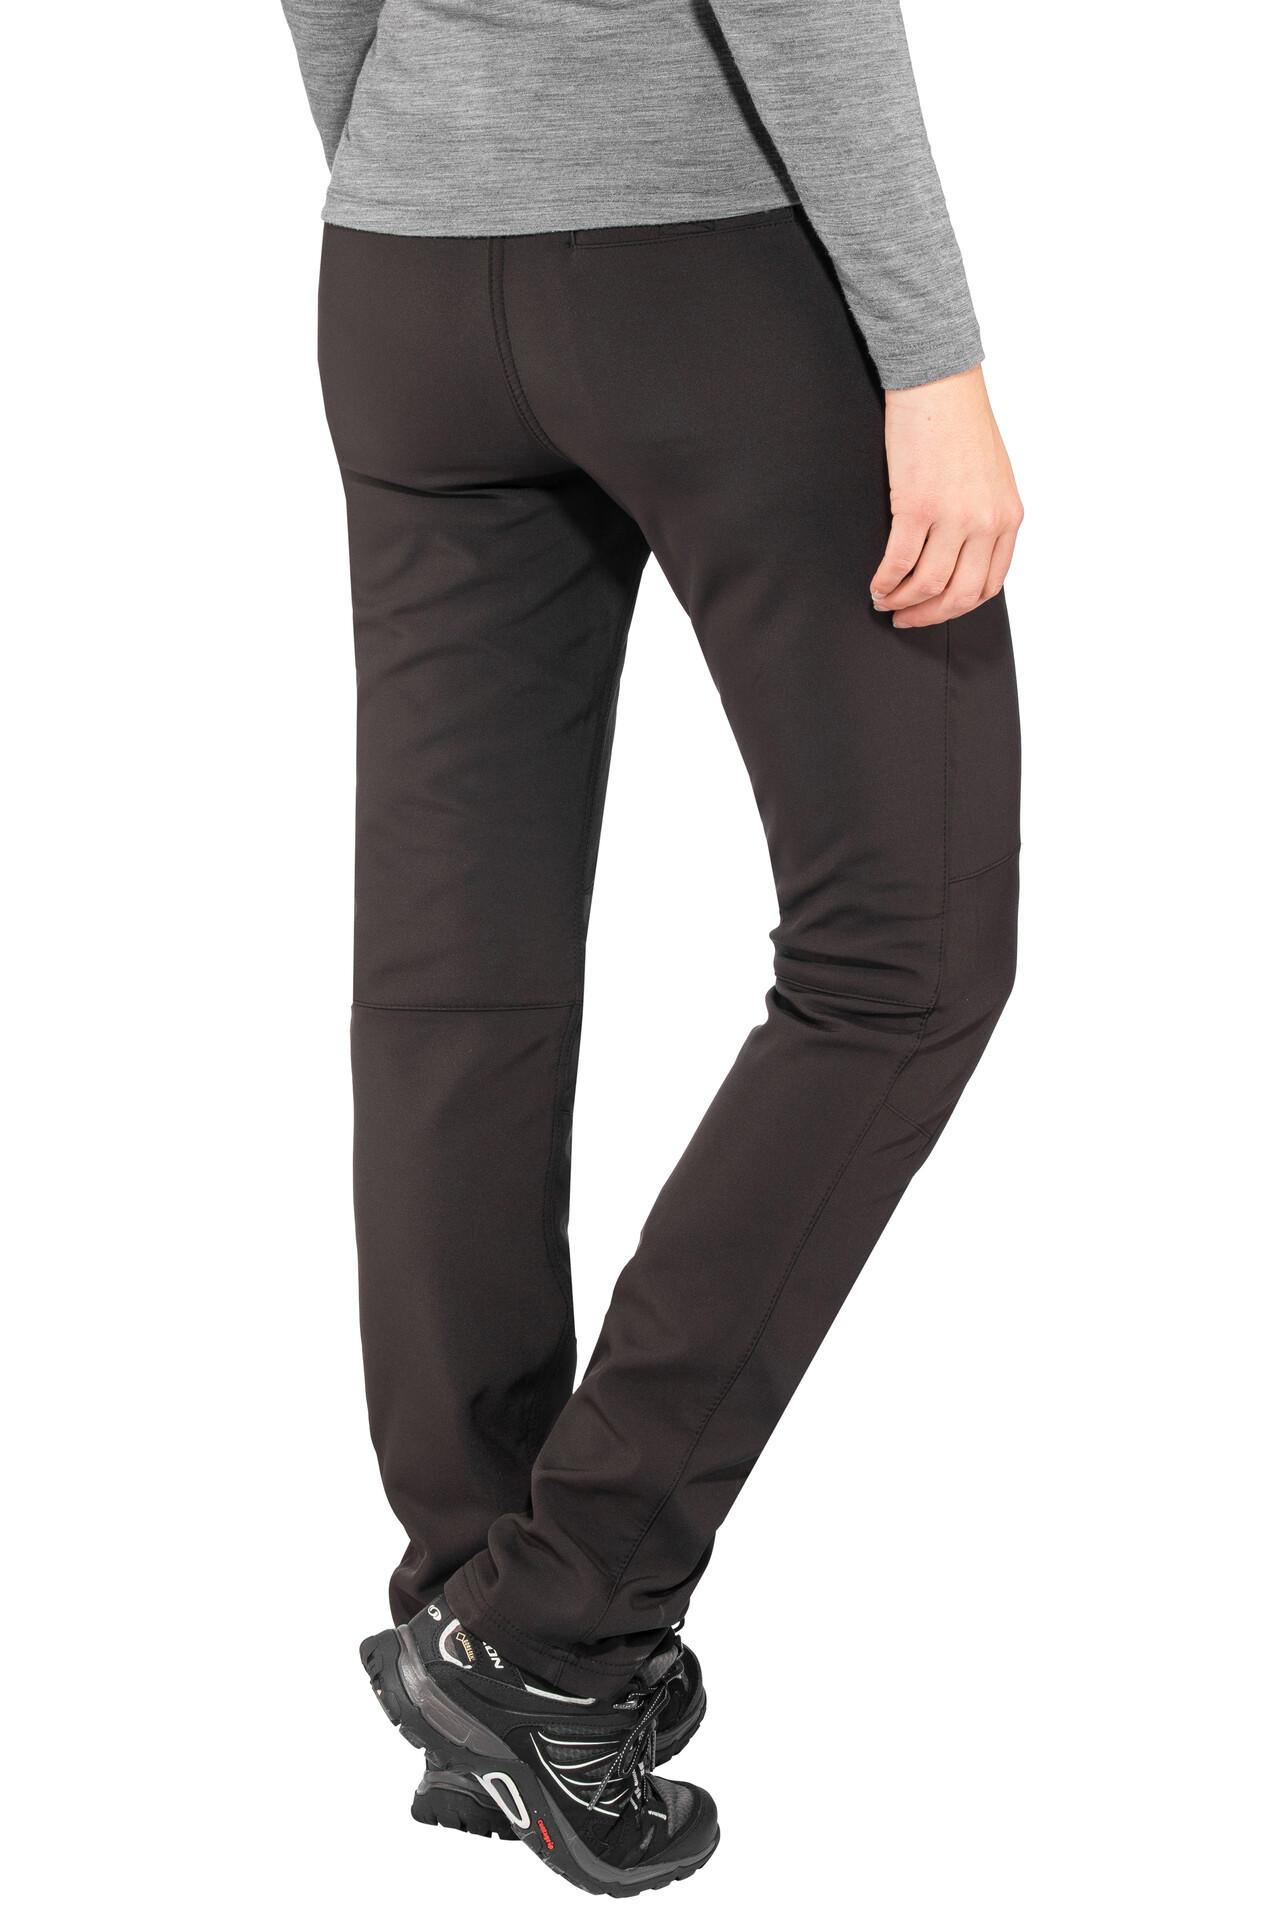 Negro 2019 Regatta Xert II Pantalones Mujer